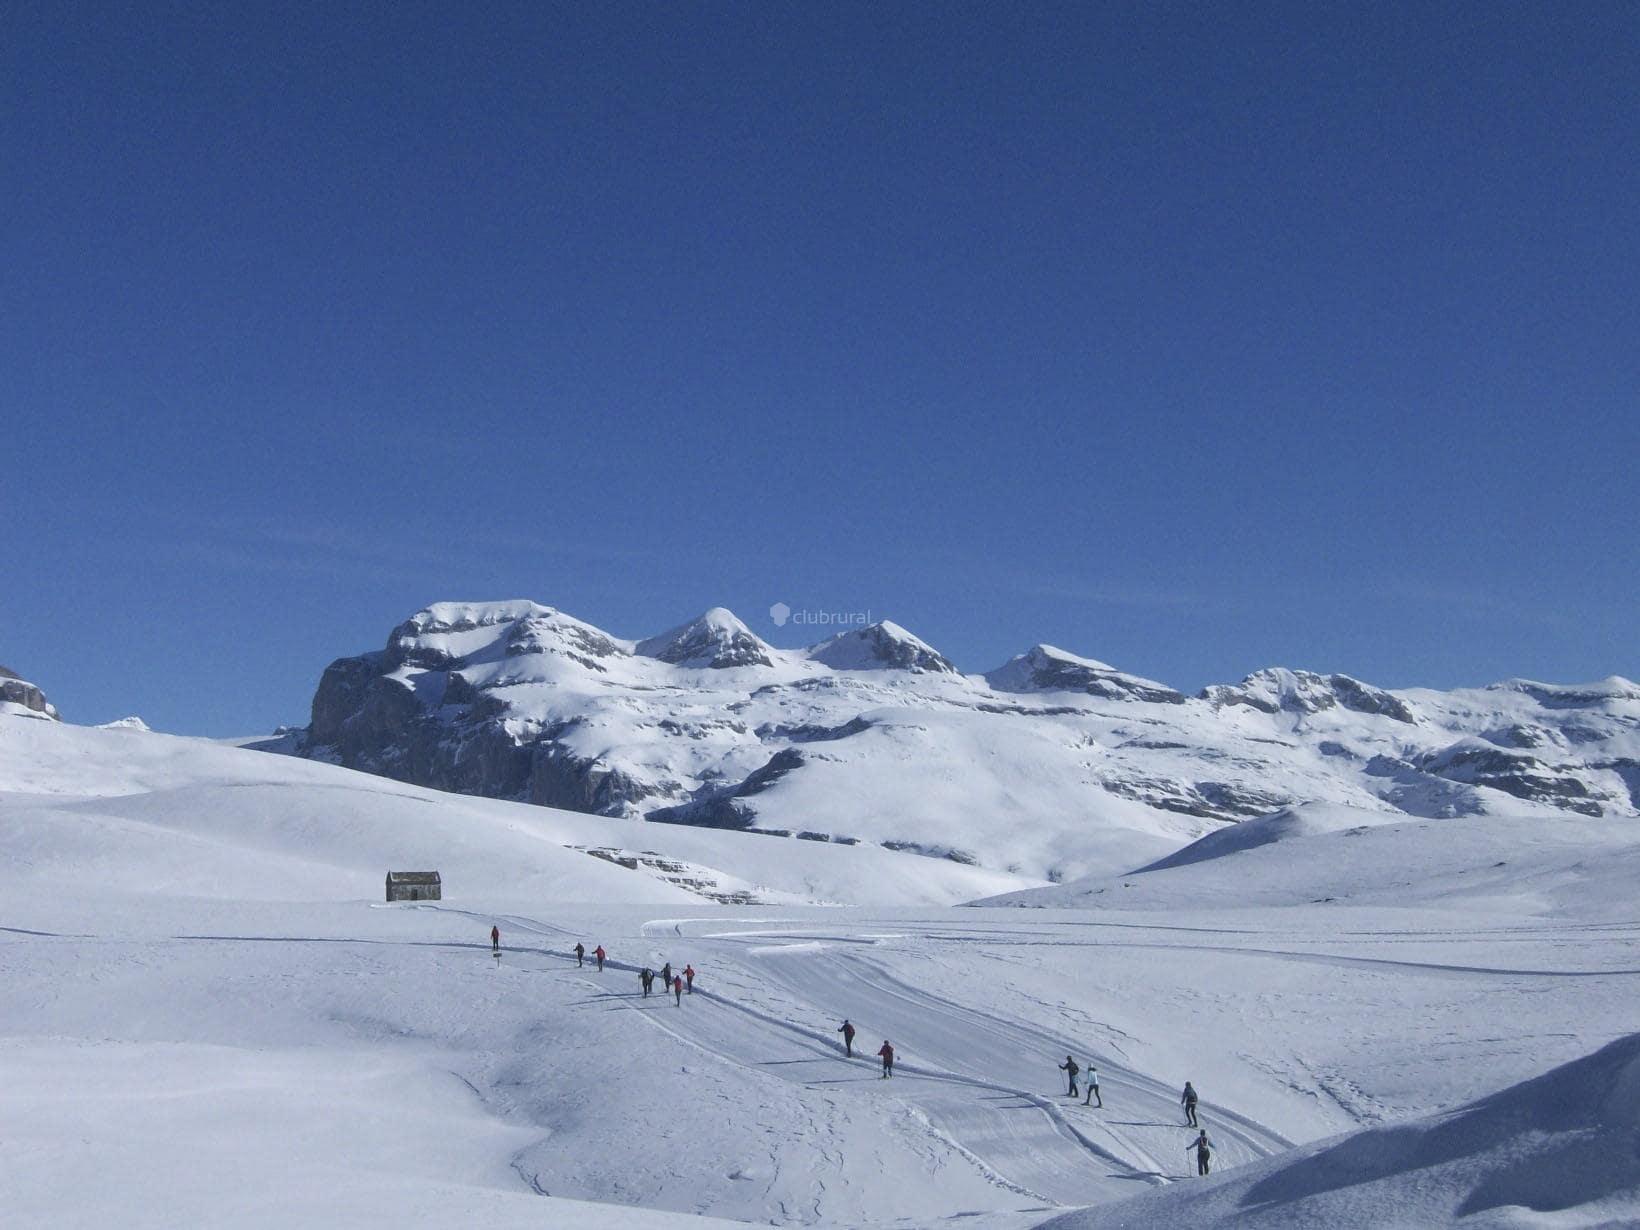 Fanlo del valle de Vio: 28 km of cross-country skiing